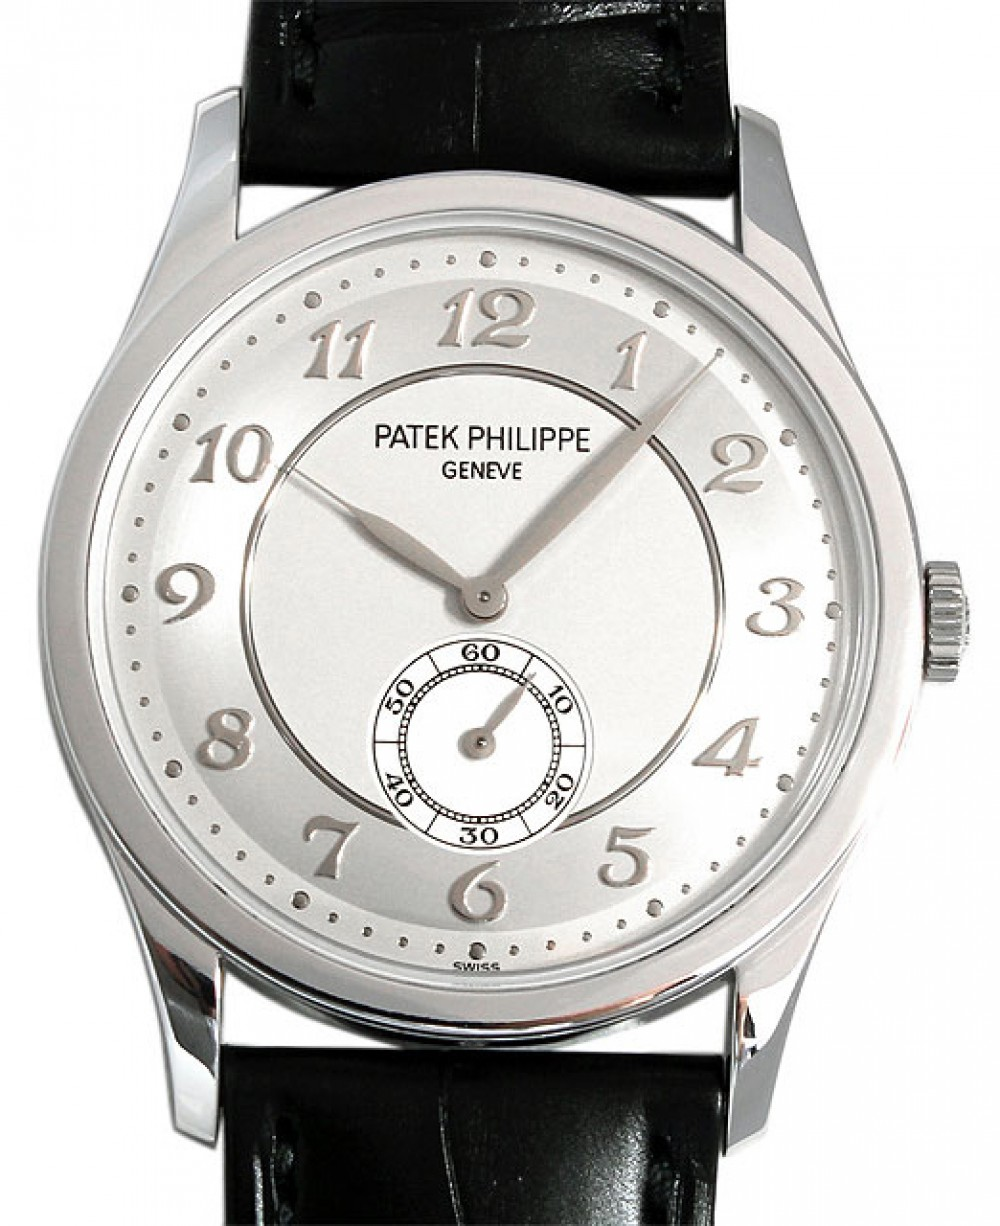 Patek Philippe 5196p 001 Calatrava 37mm Silver Arabic Platinum Leather Brand New